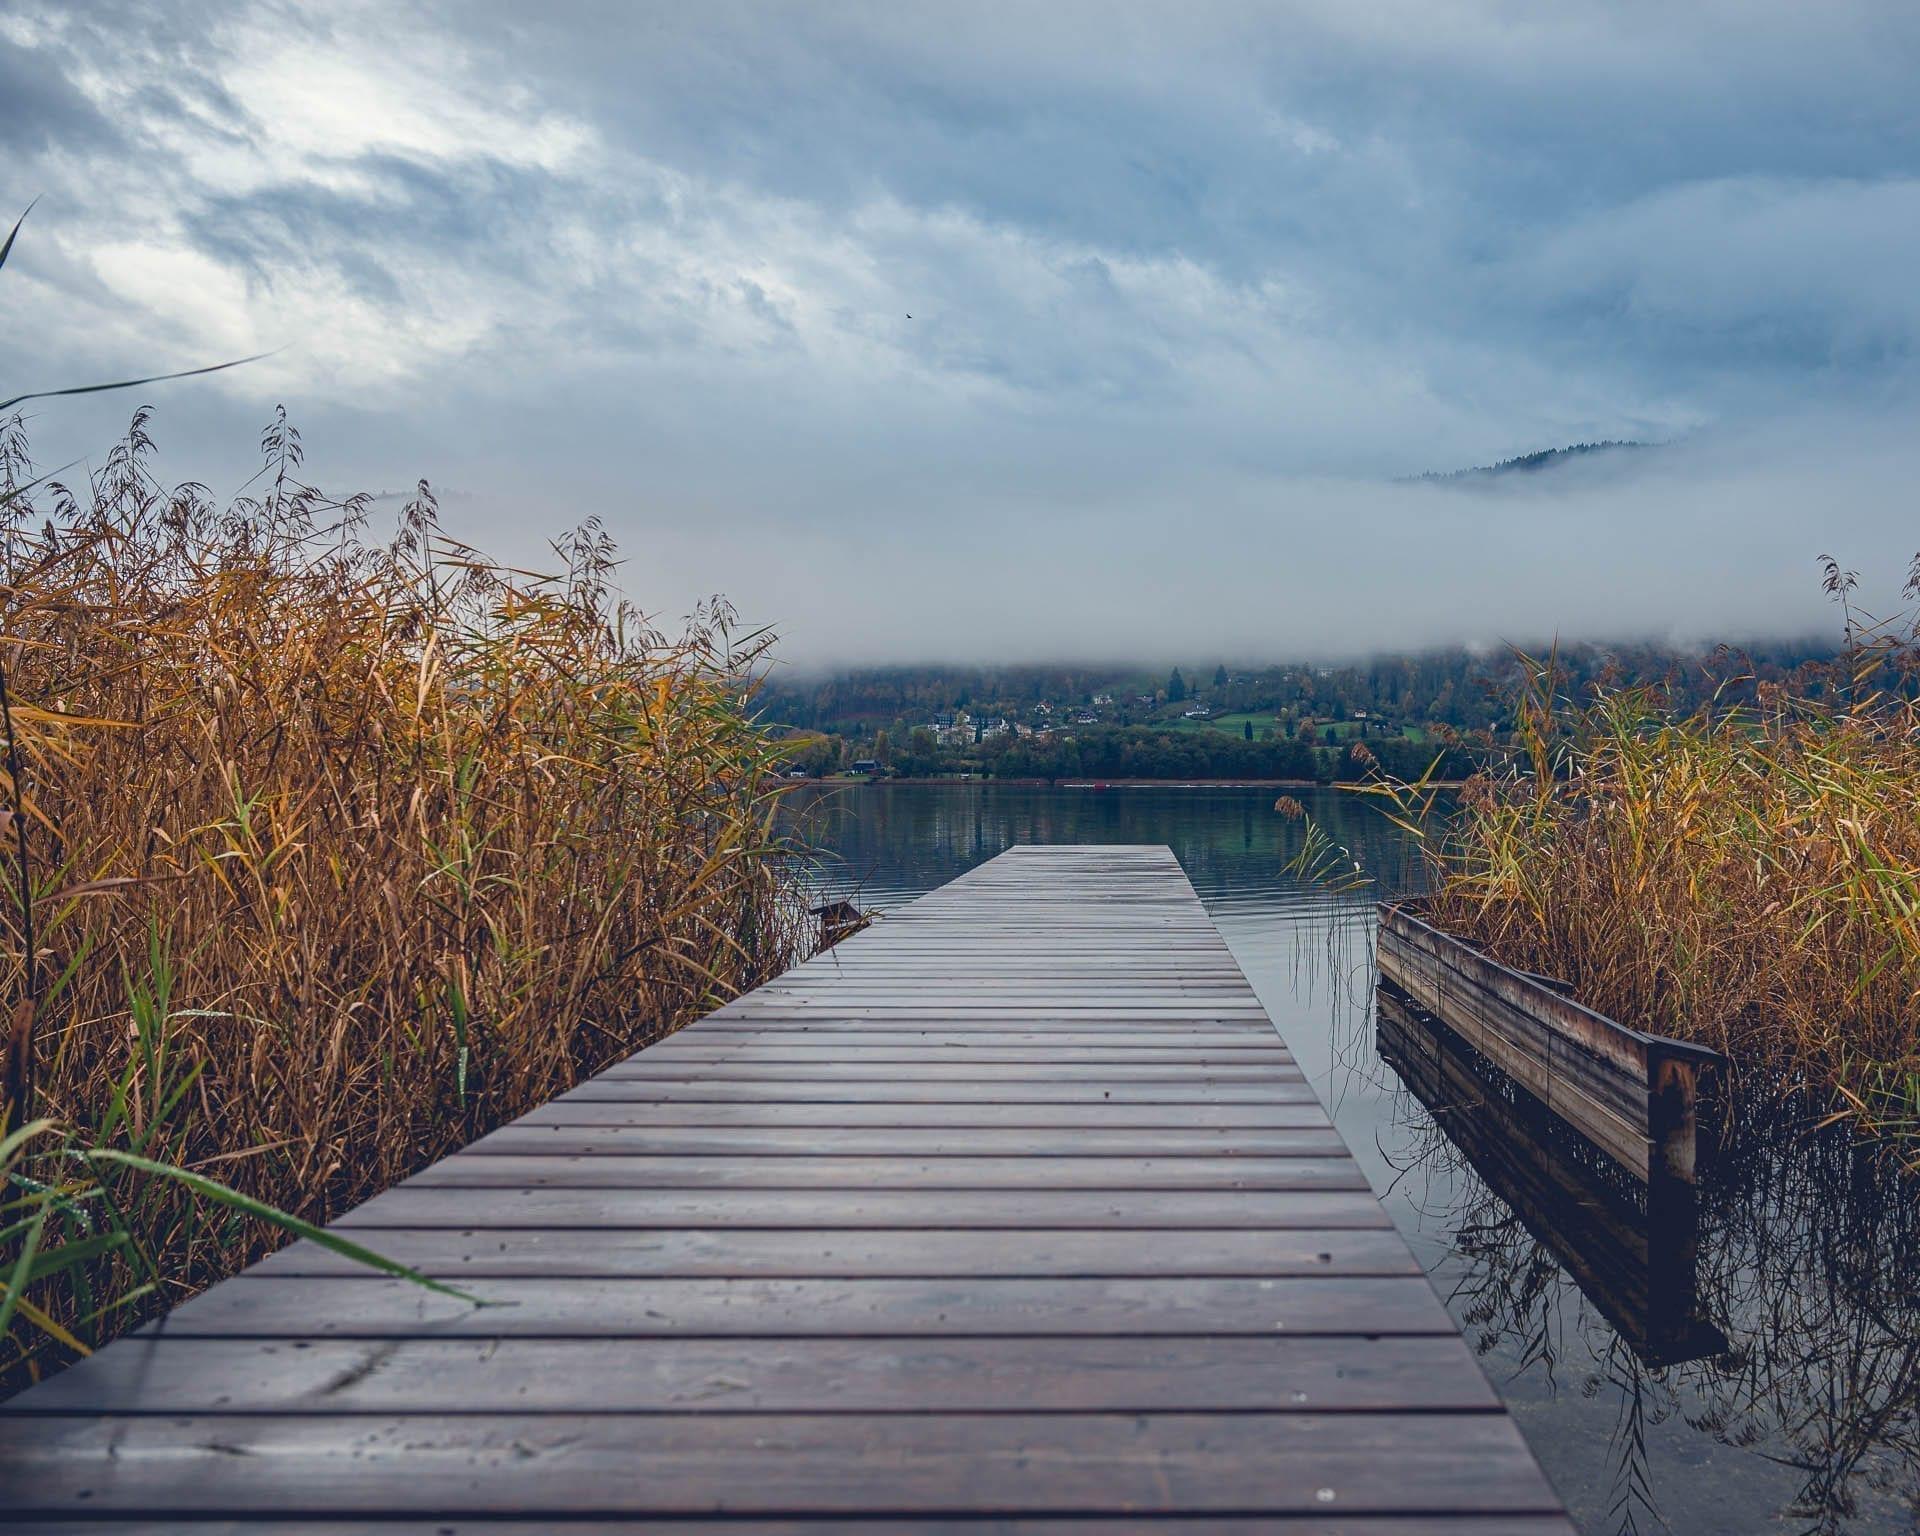 Steg am Ossiacher See zum Thema Disziplin